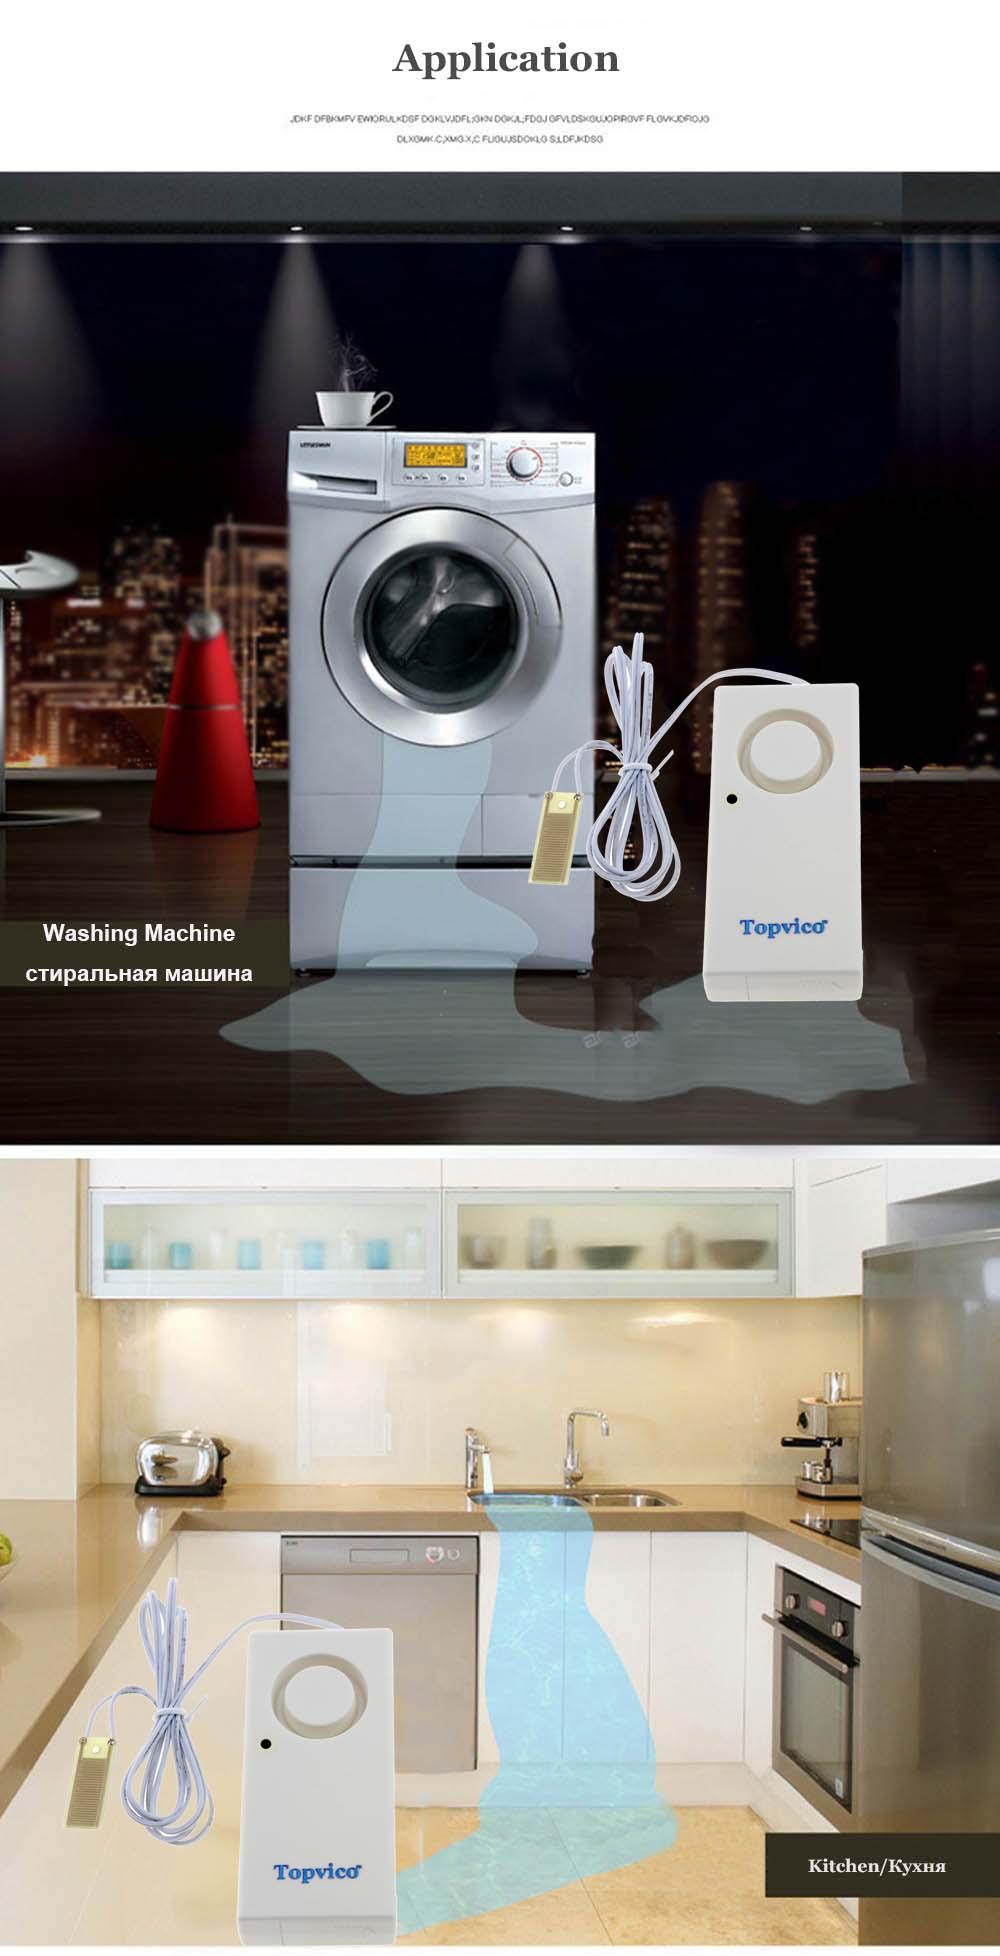 water sensor alarm details